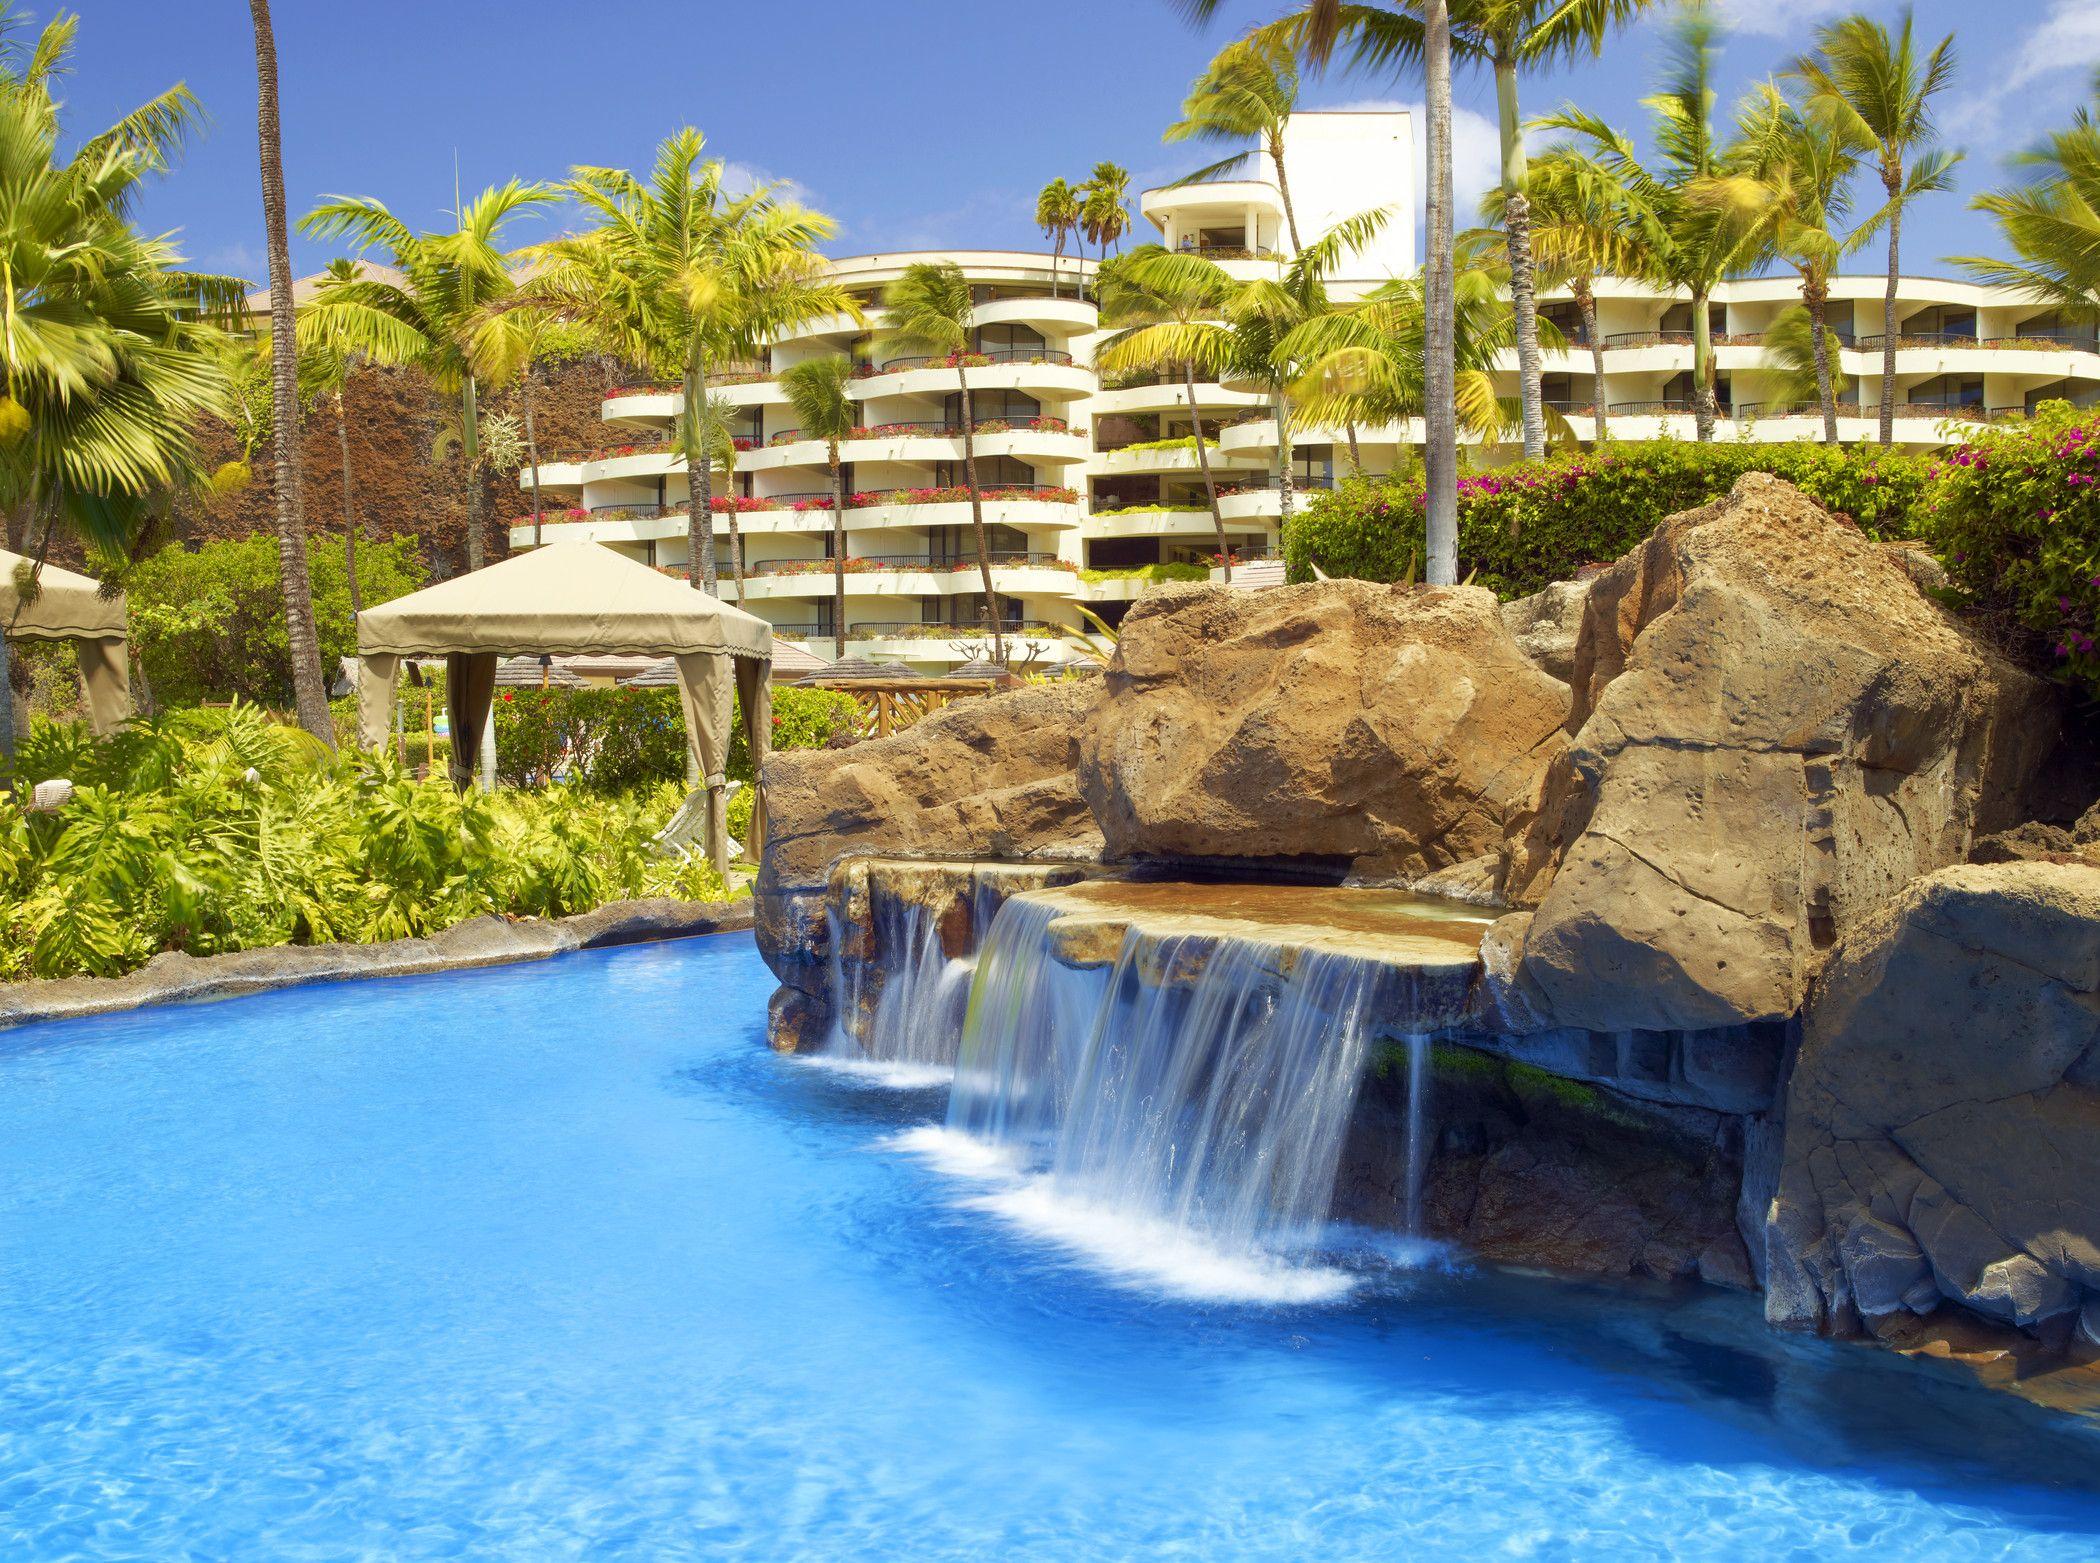 Sheraton Maui Resort Amp Spa Maui Resorts Hawaii Hotels